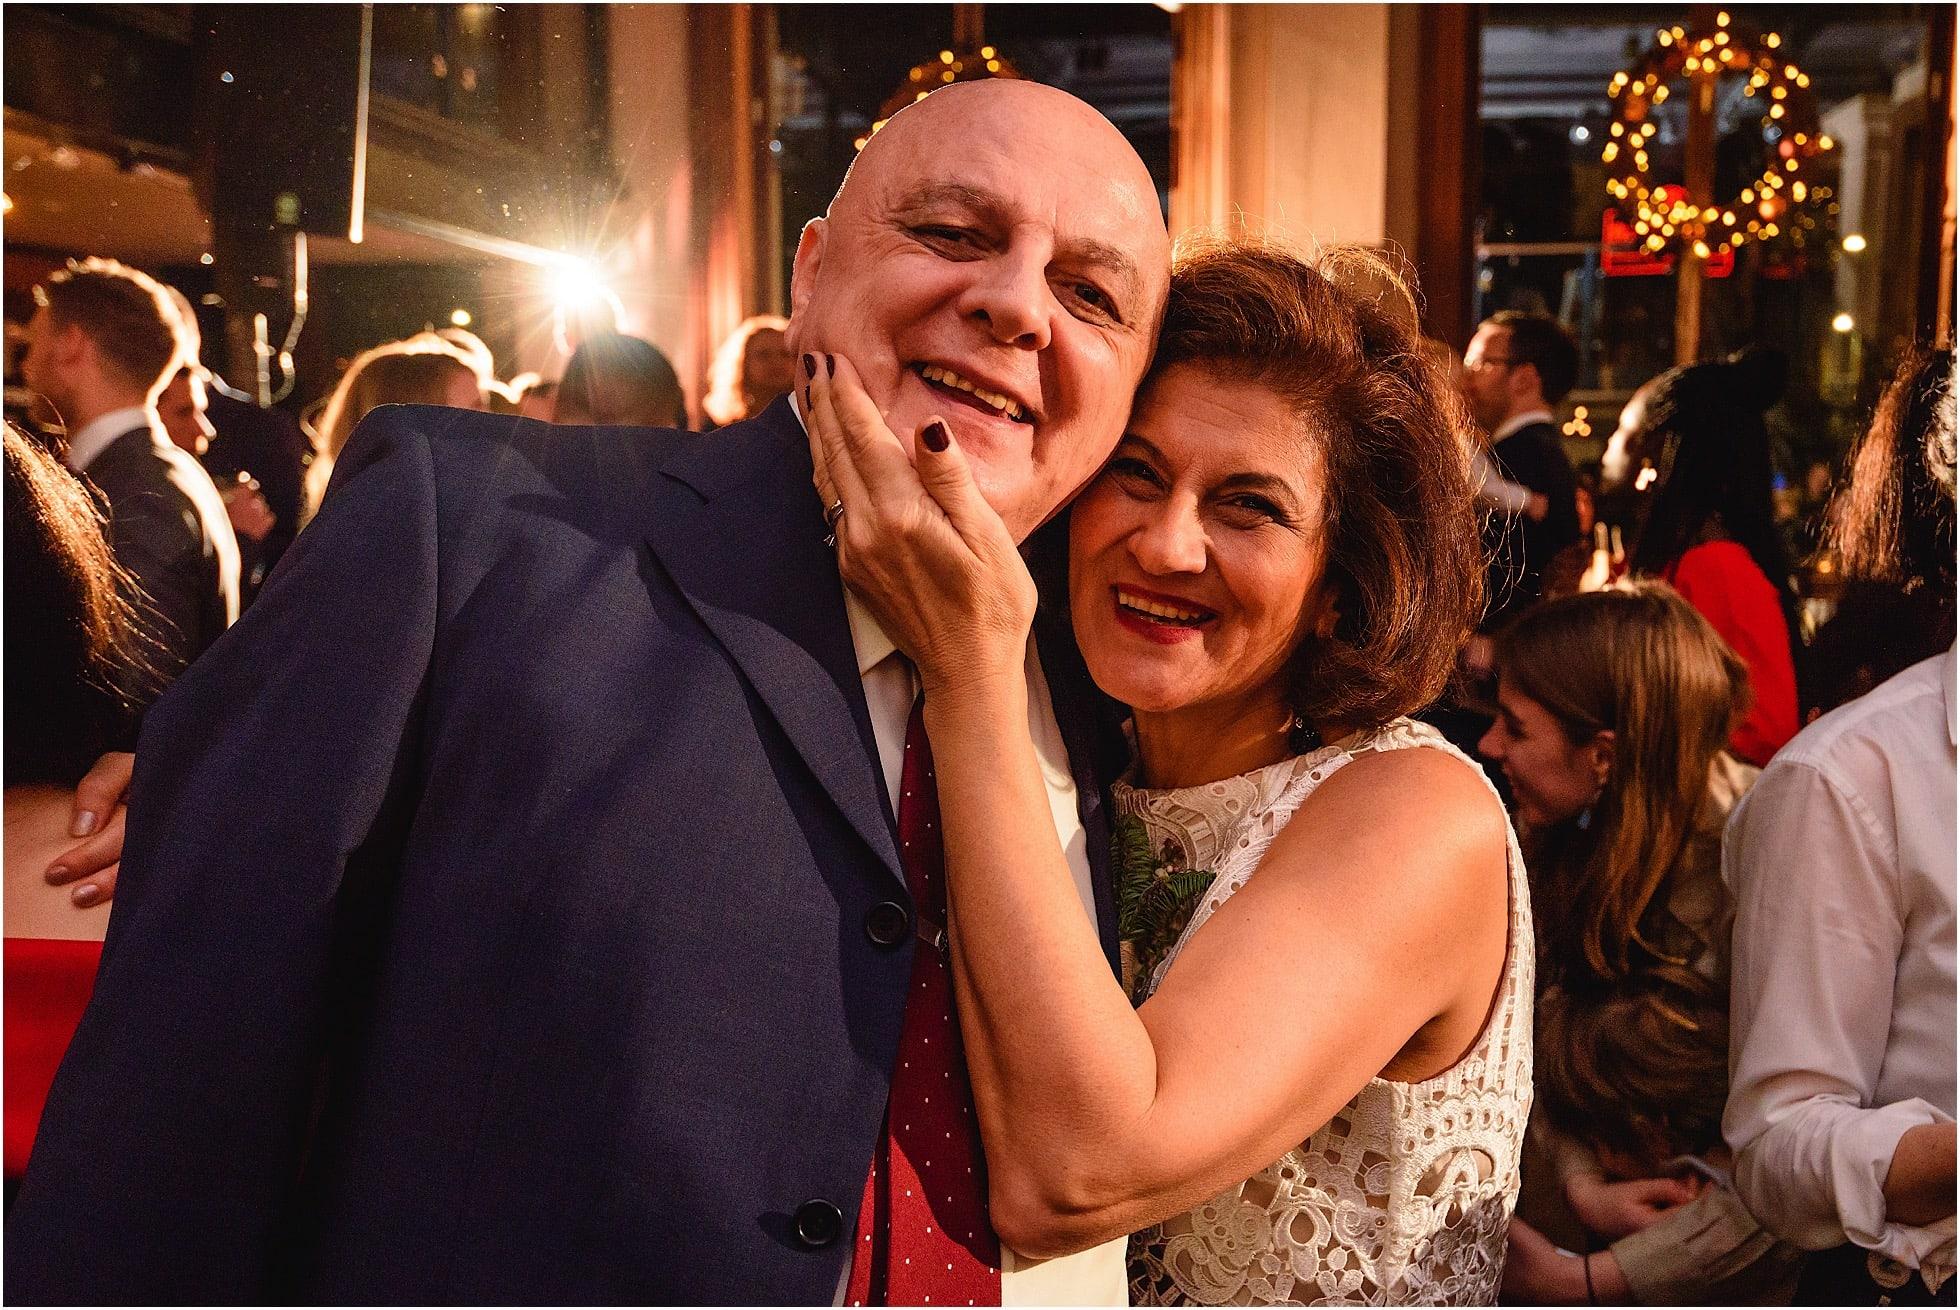 mum and dad smiling